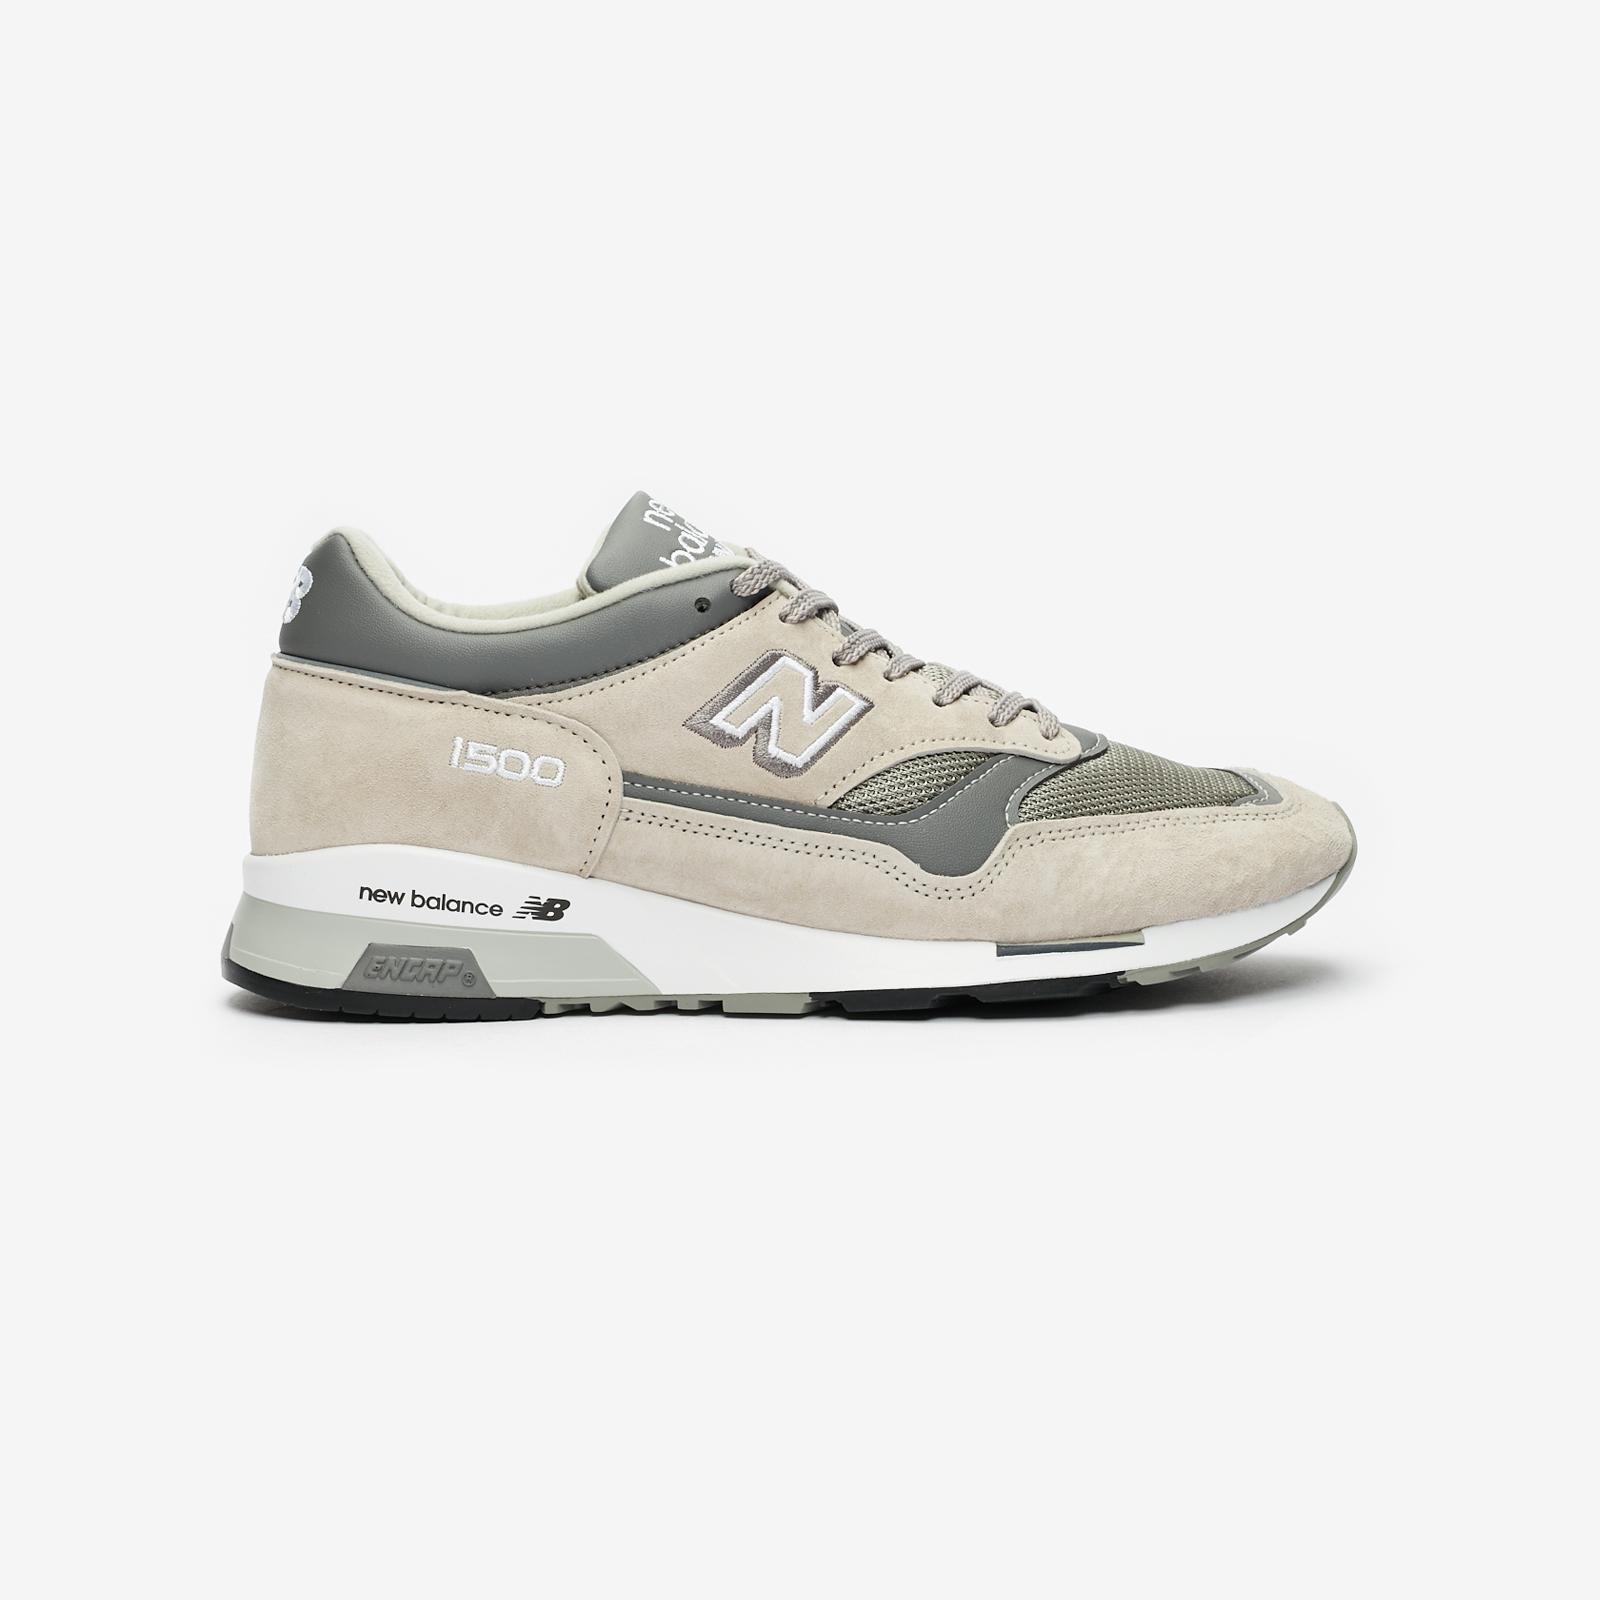 New Balance M1500 - M1500pgl - SNS | sneakers & streetwear online ...